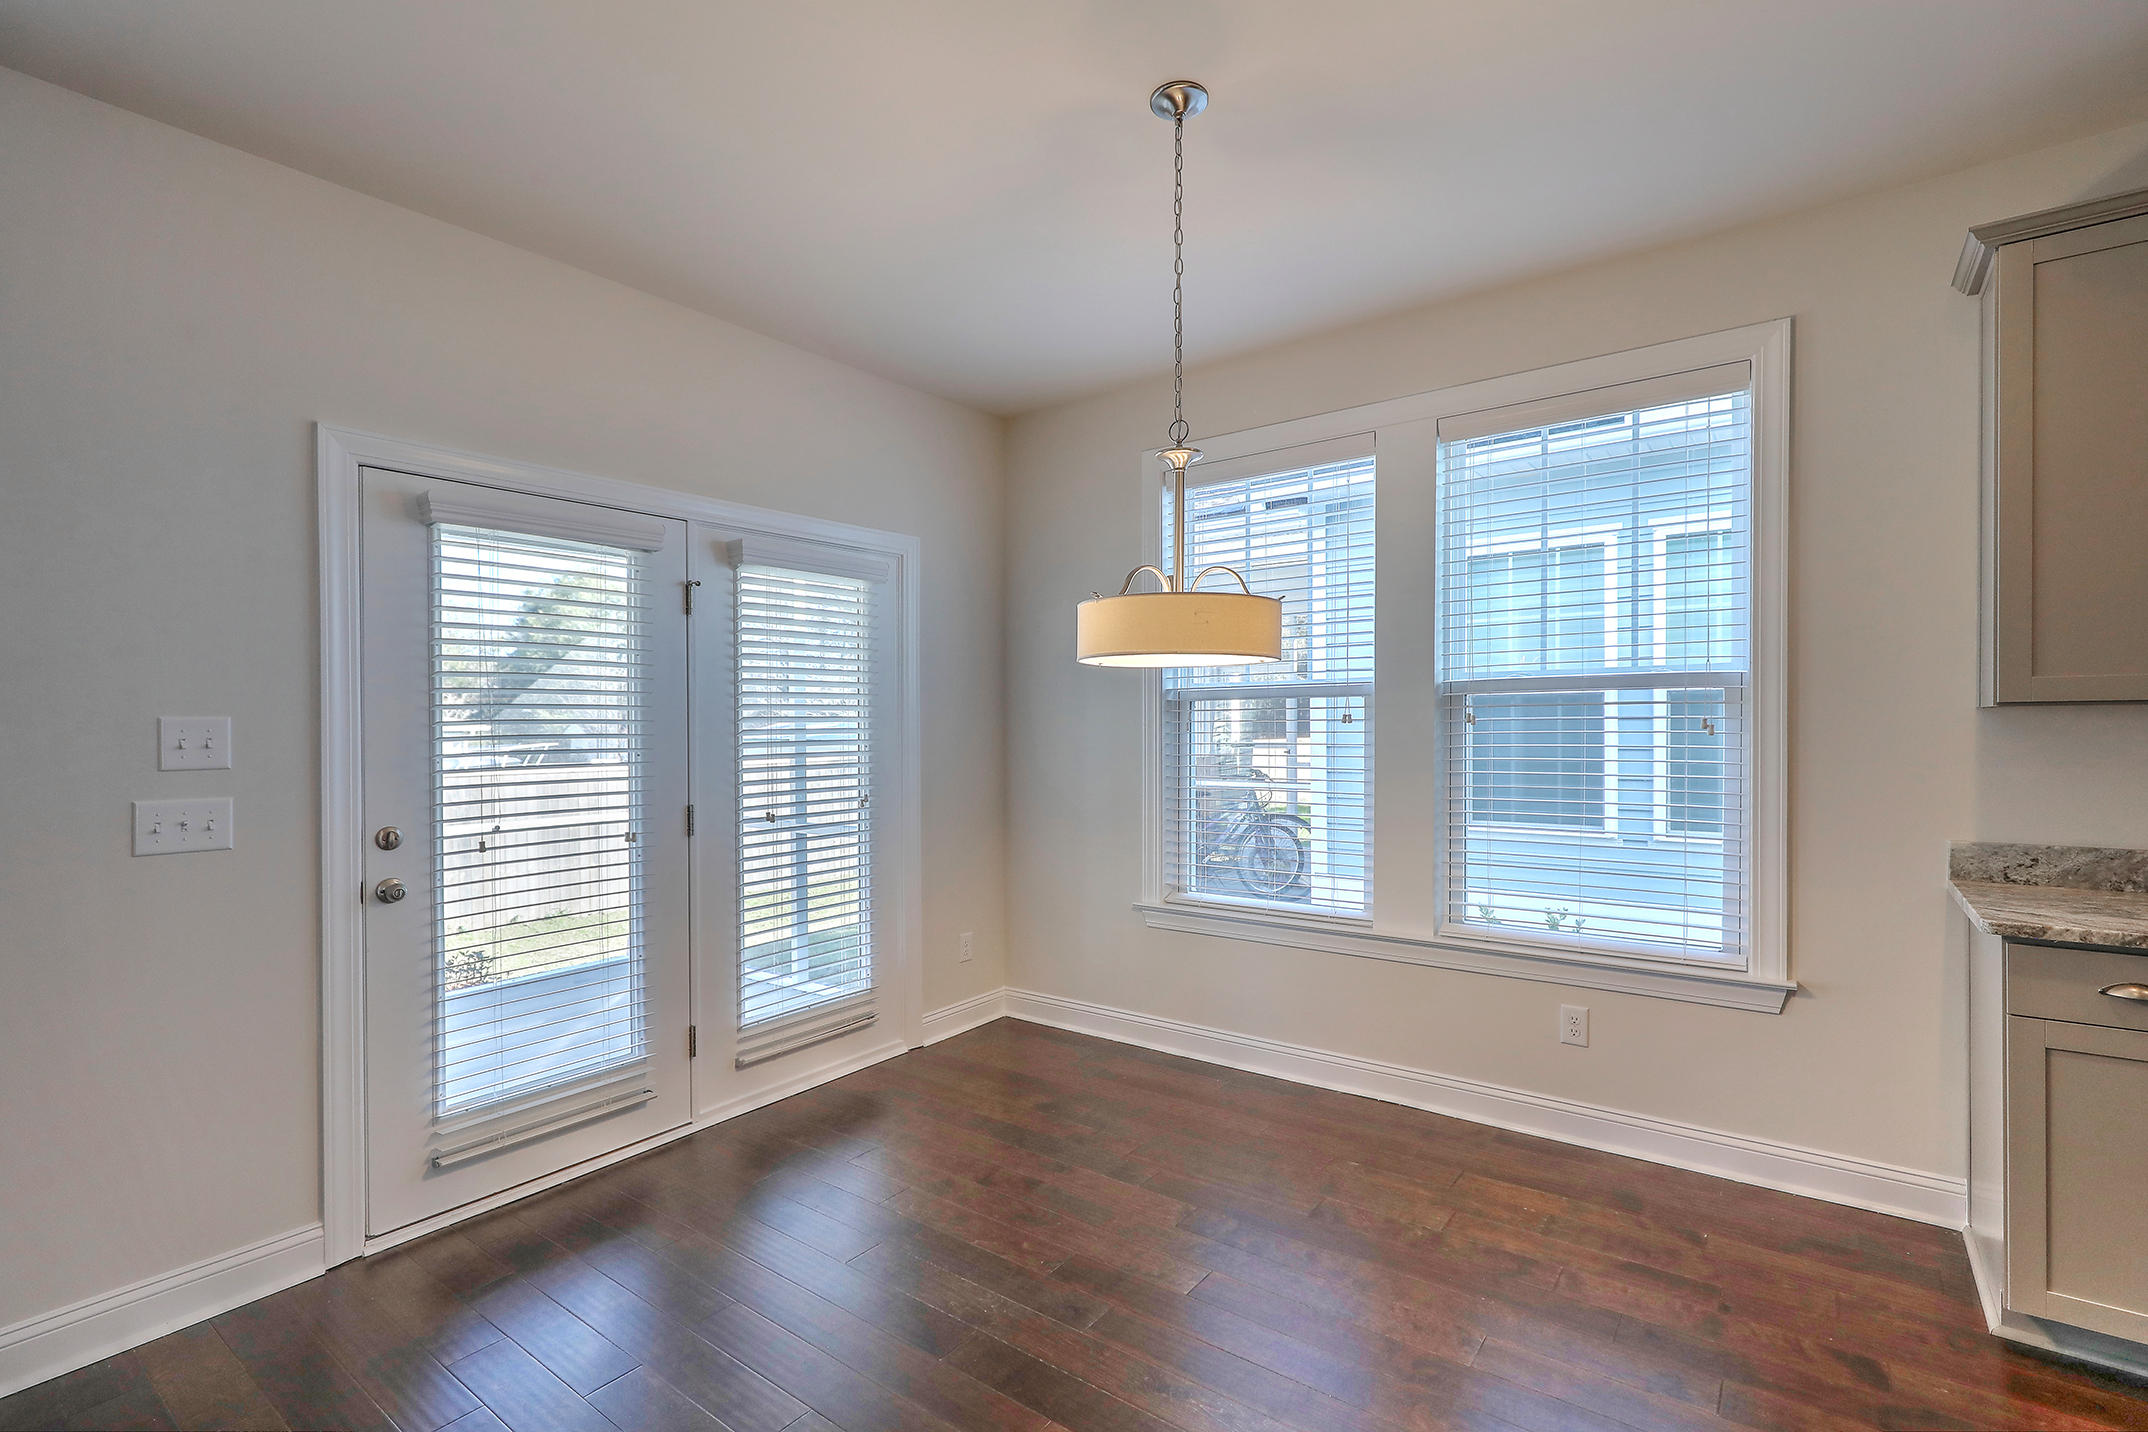 Bentley Park Homes For Sale - 1281 Gannett, Mount Pleasant, SC - 12